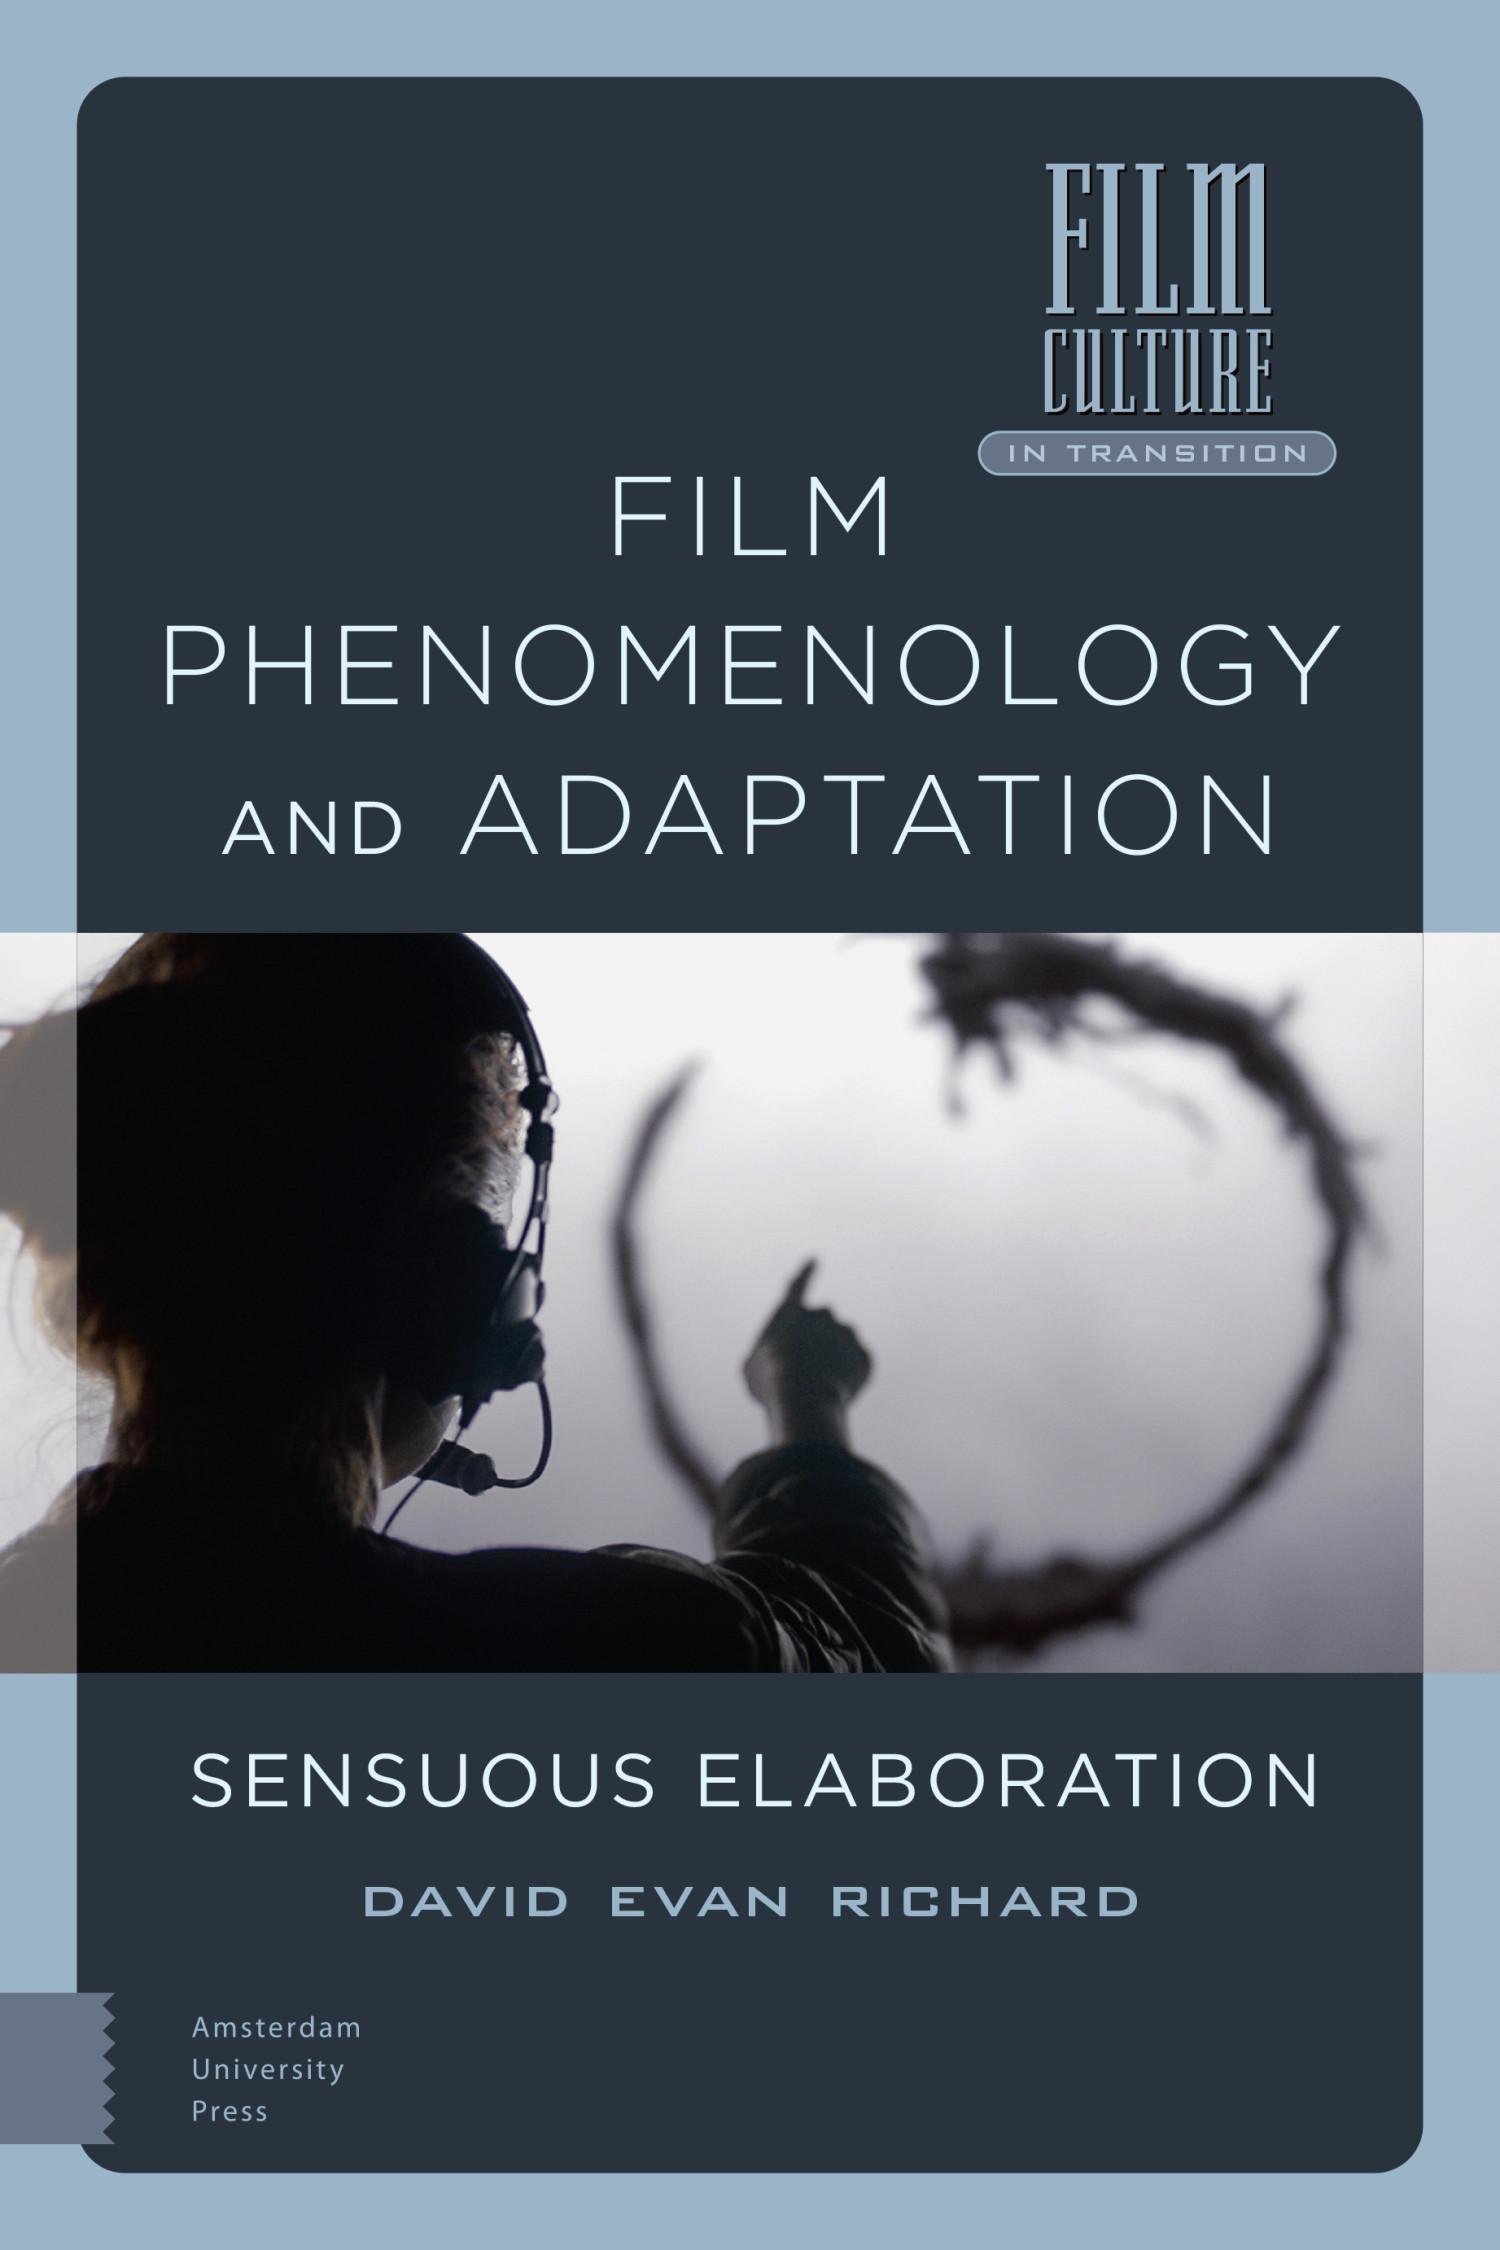 Film Phenomenology and Adaptation: Sensuous Elaboration Book Cover